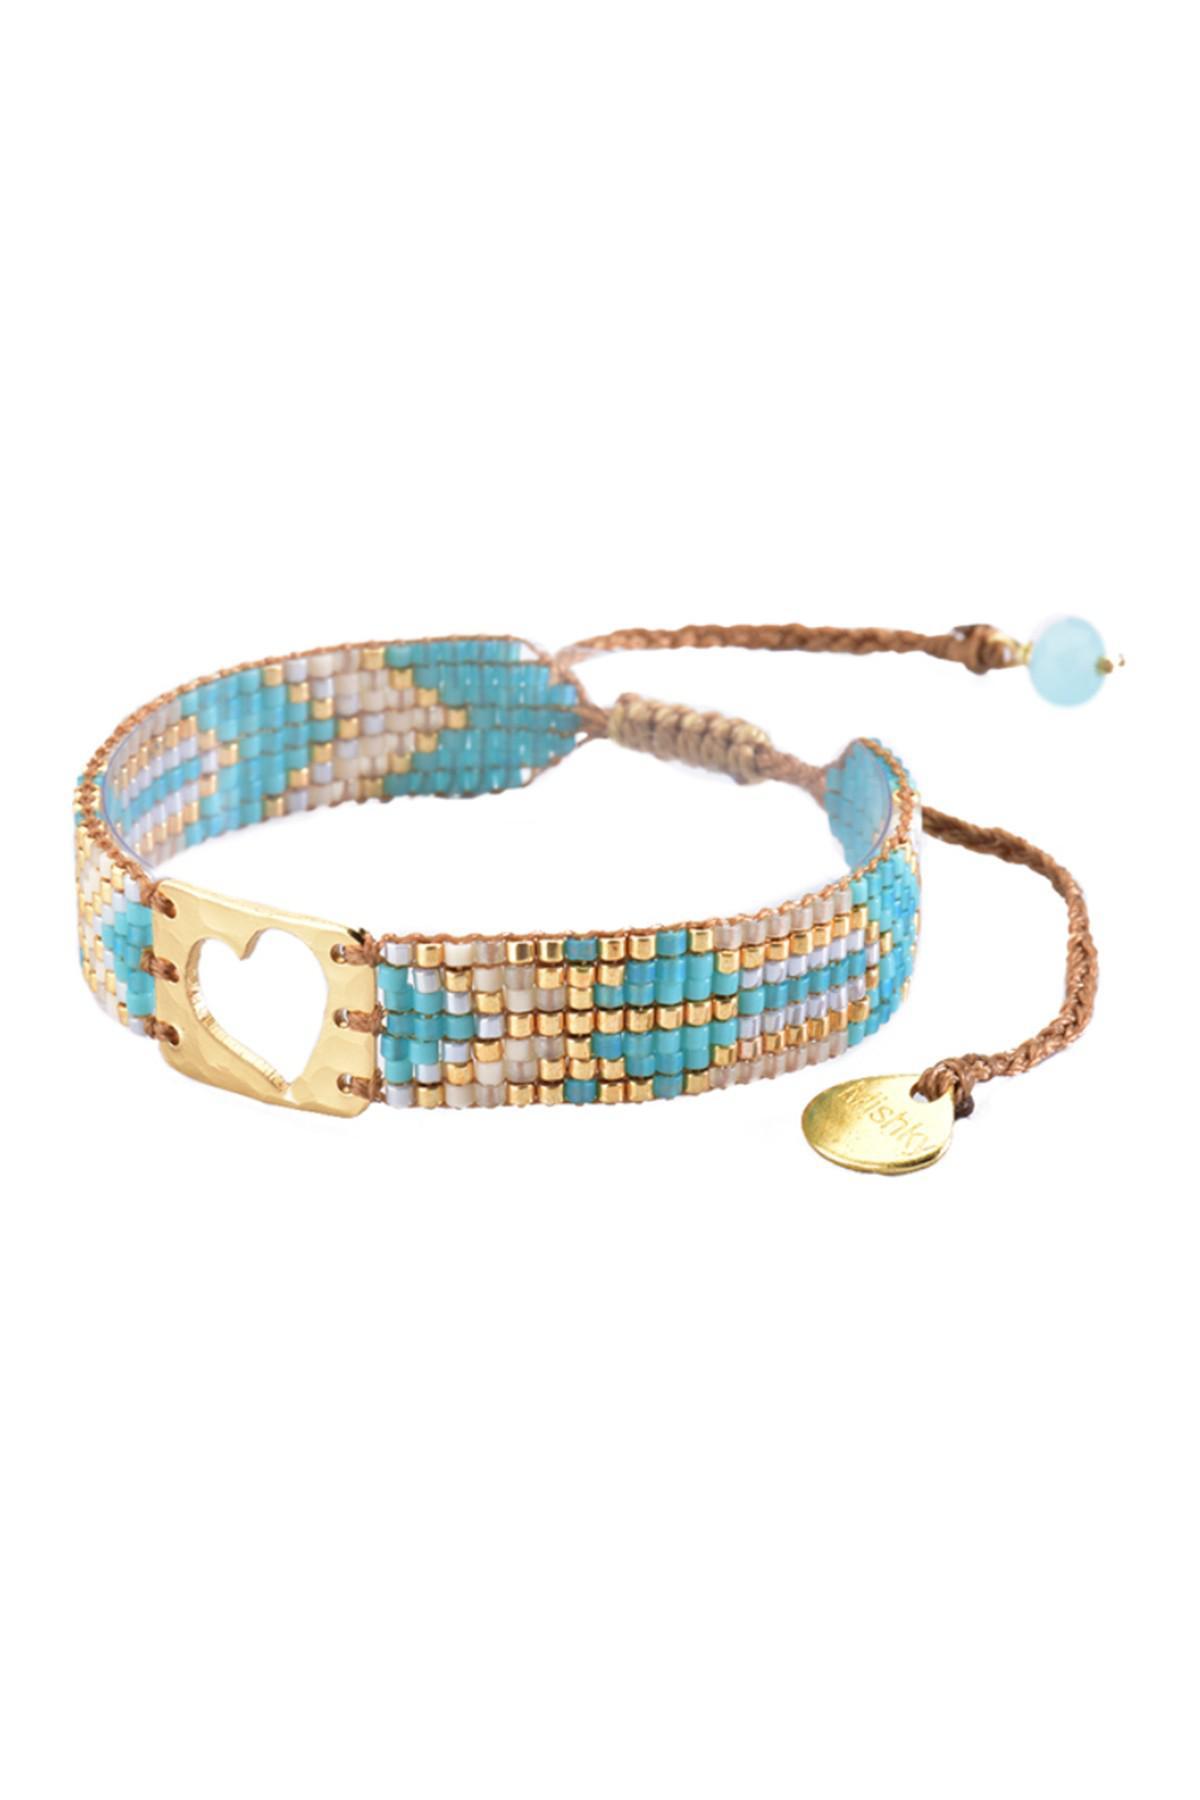 Mishky See You Later Beaded Bracelet MV0yX4Ij